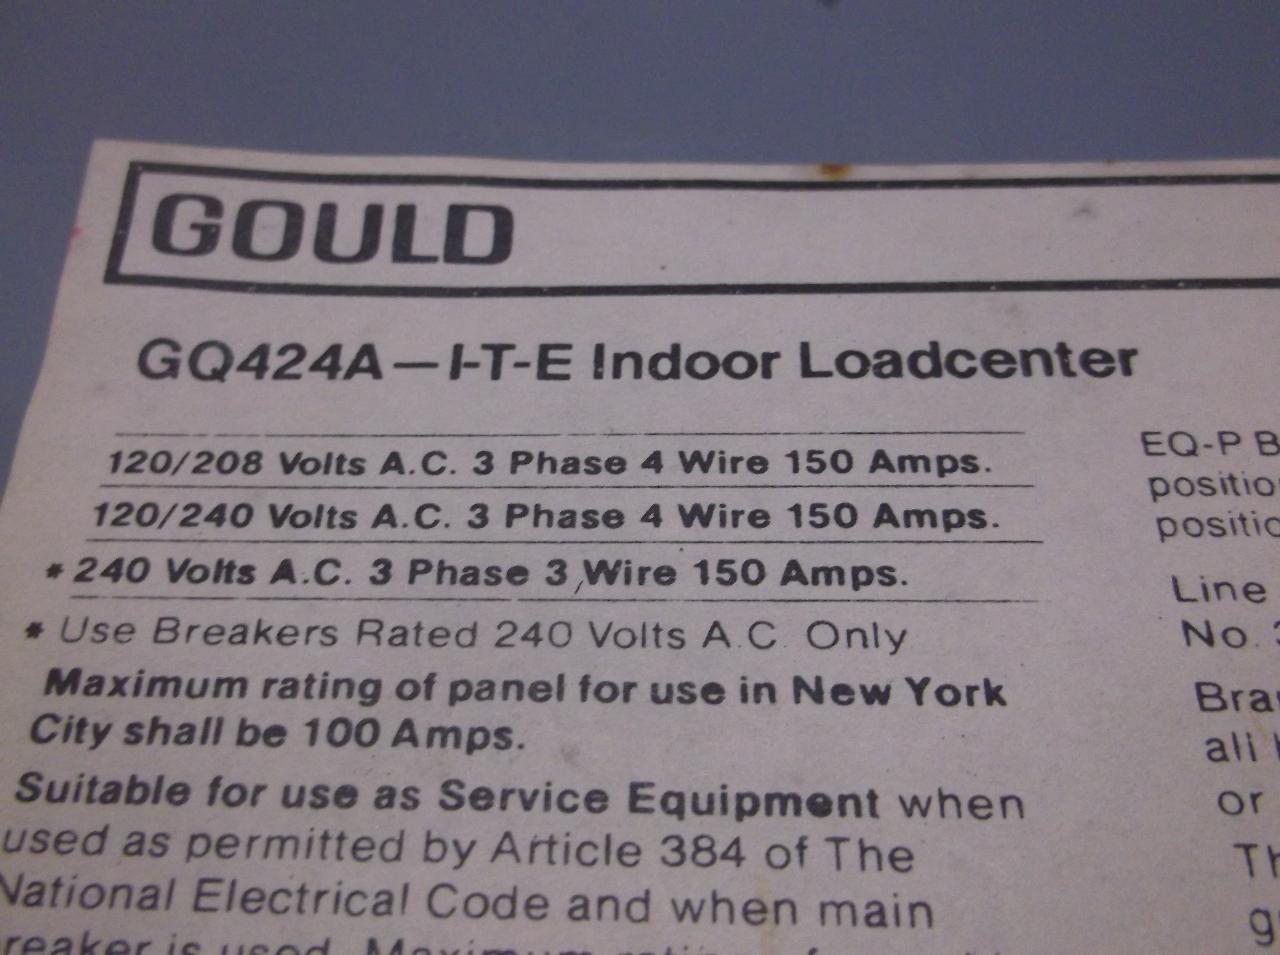 Gould Gq424a Indoor Load Center 120 240 Volt 150 Amp